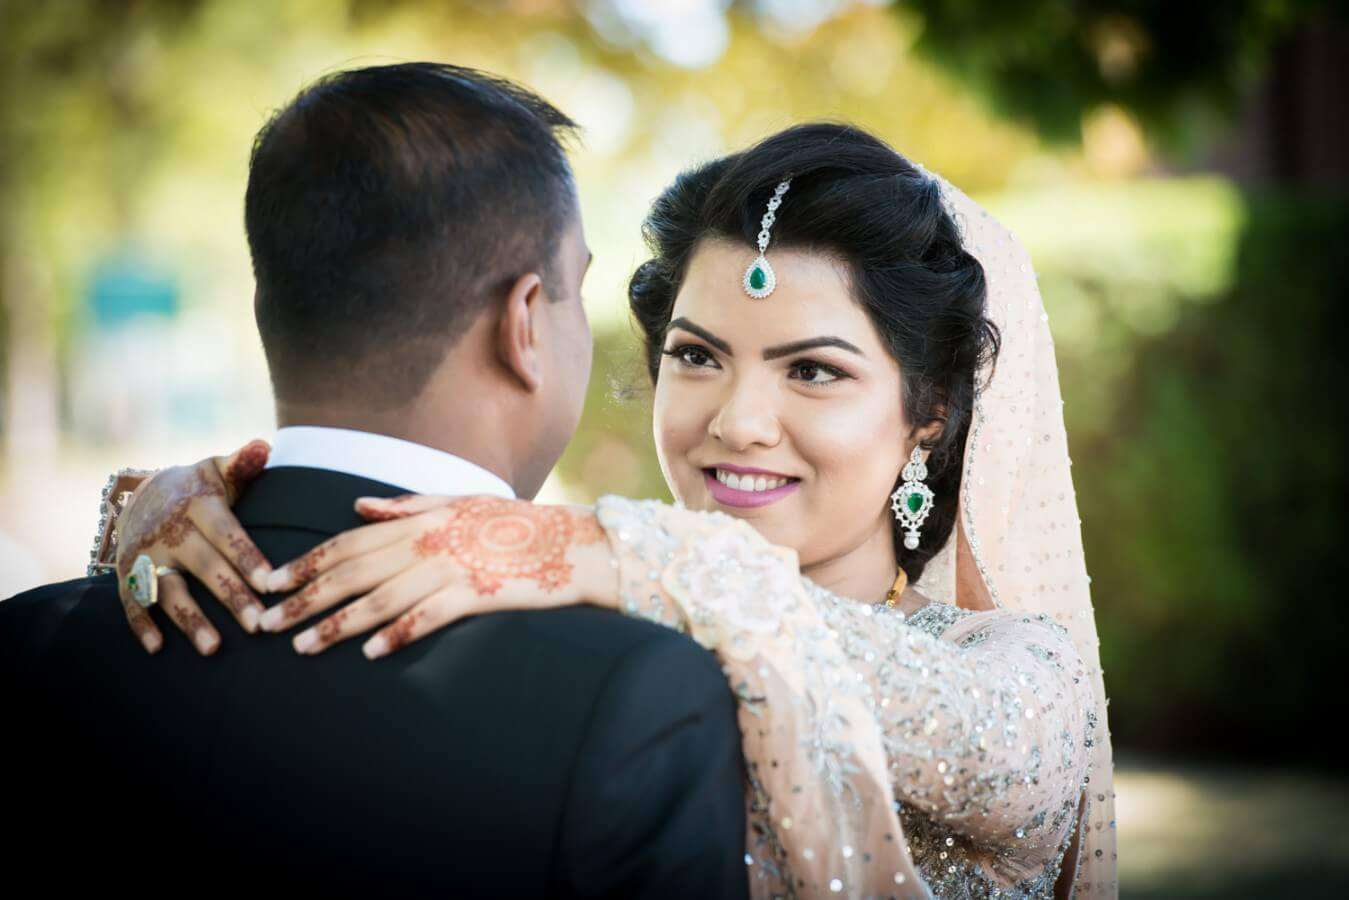 Indian Weddings Photographer in NJ